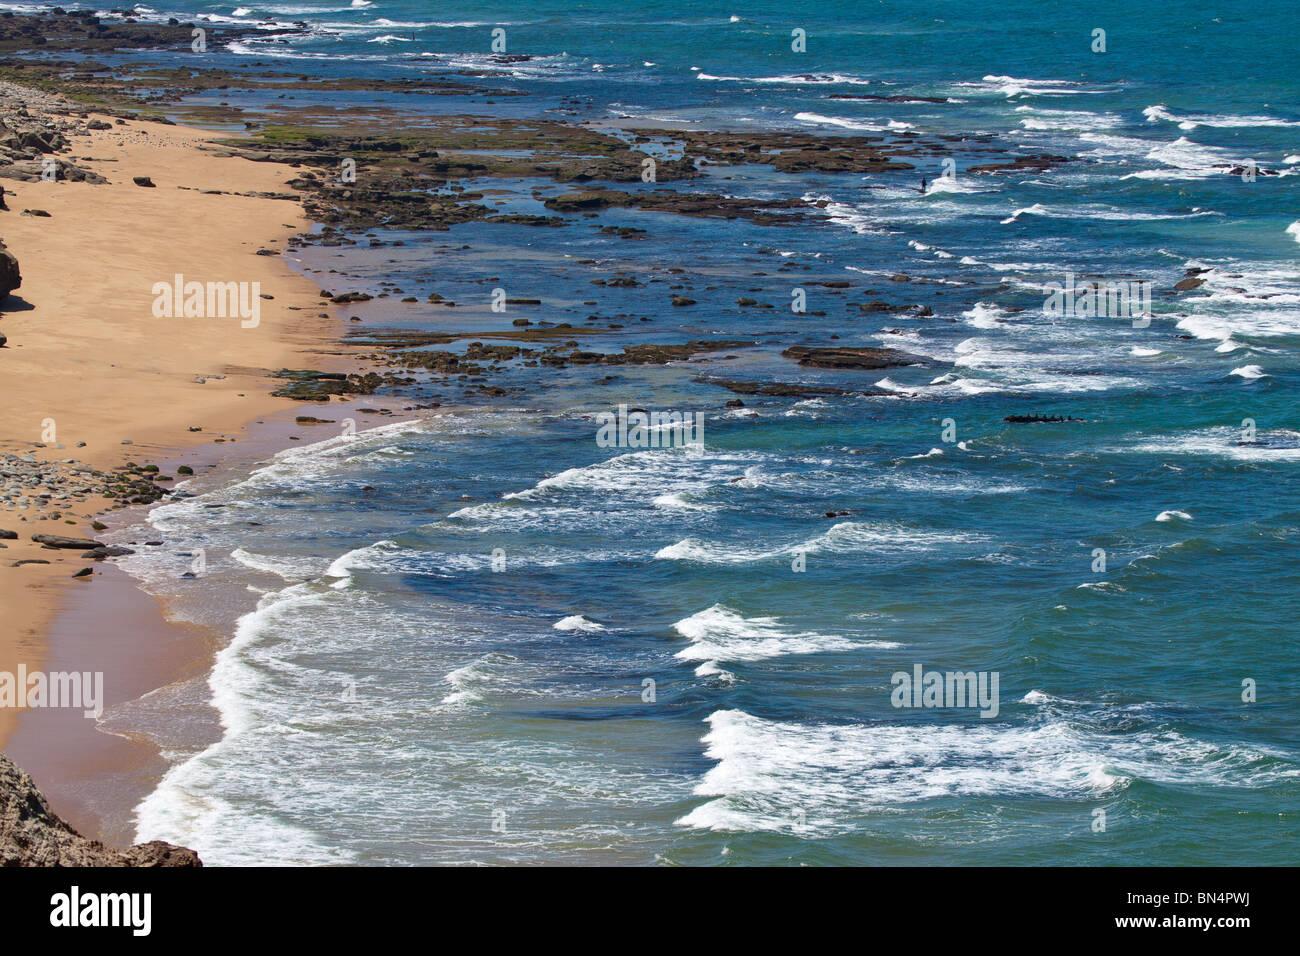 atlantic beach loneliness peaceful portugal quiet. solitary sea sisandro torres vedras - Stock Image